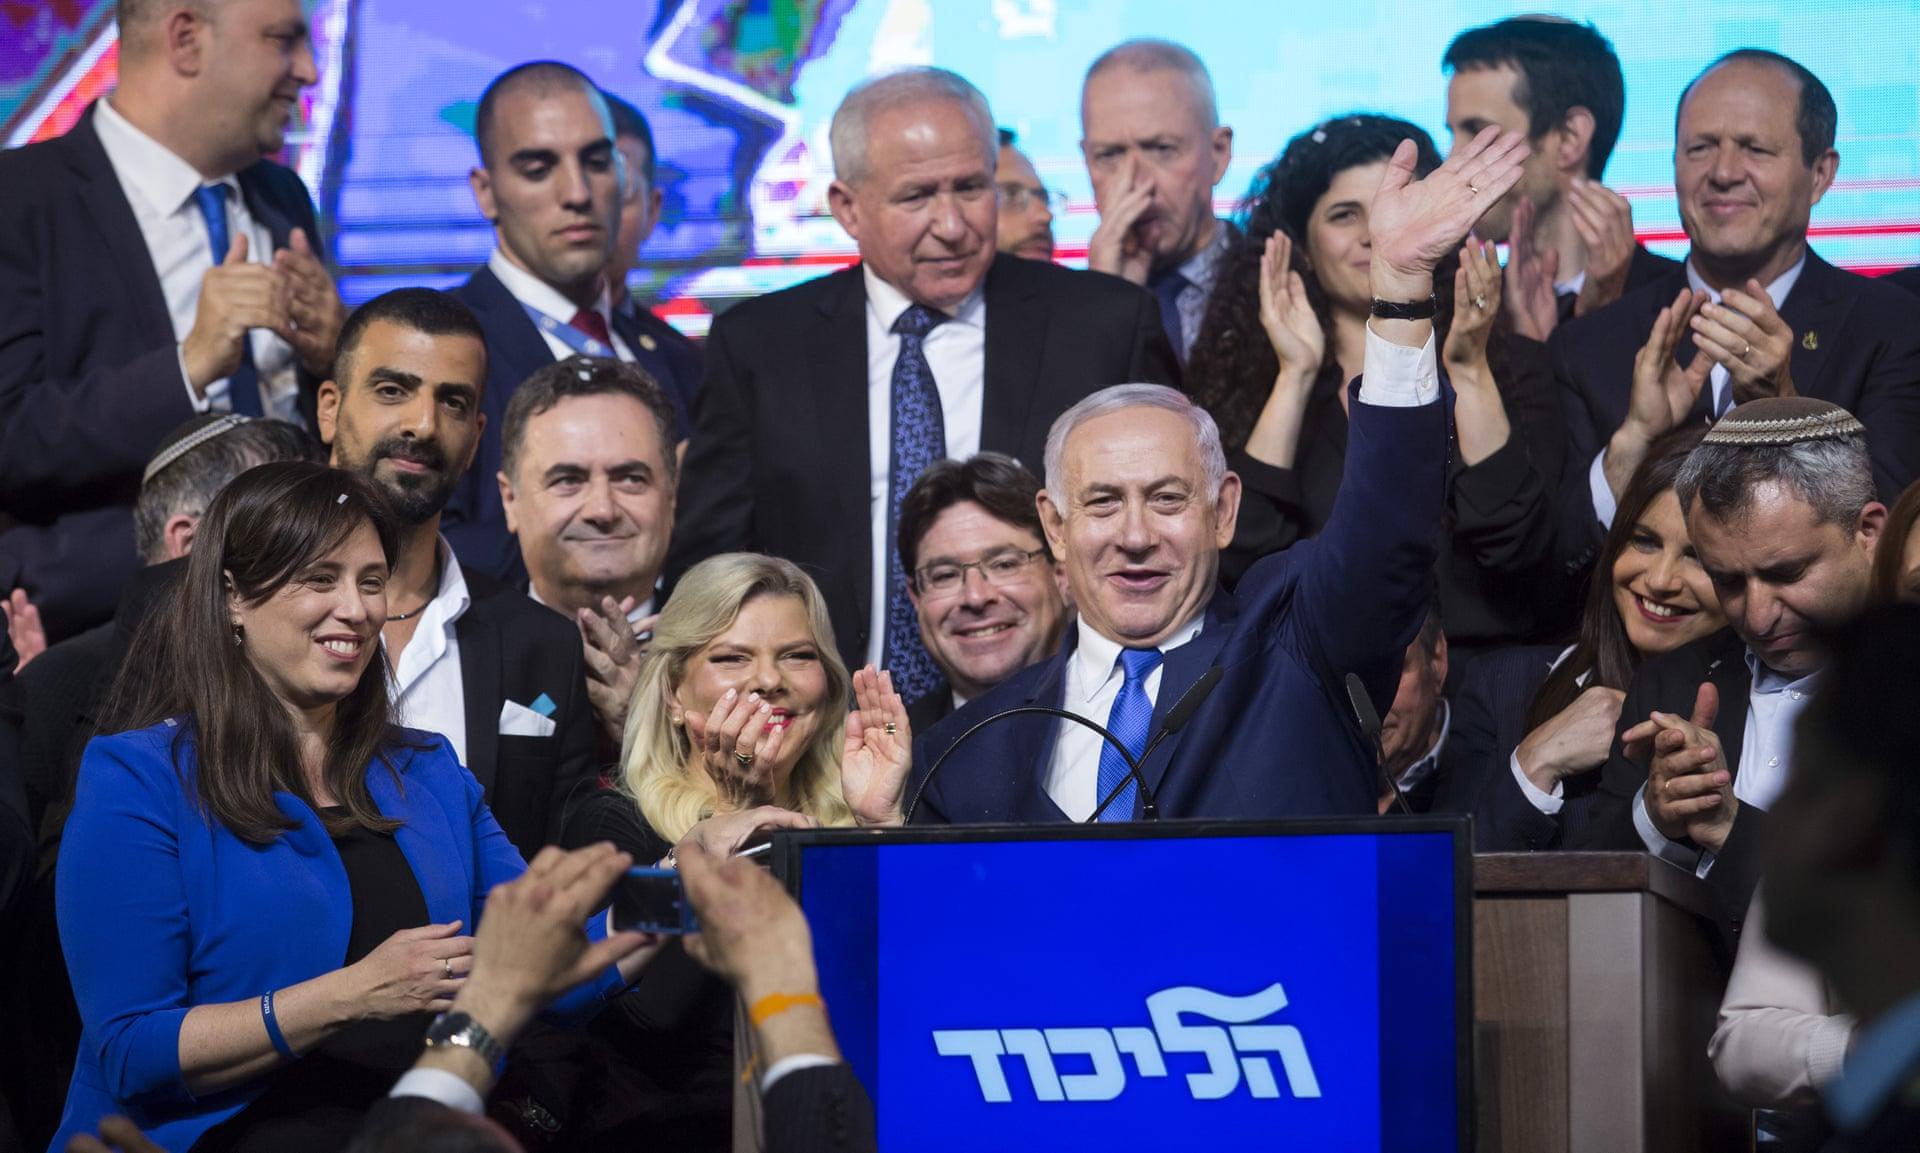 Israel's Netanyahu secures election victory: Israeli TV